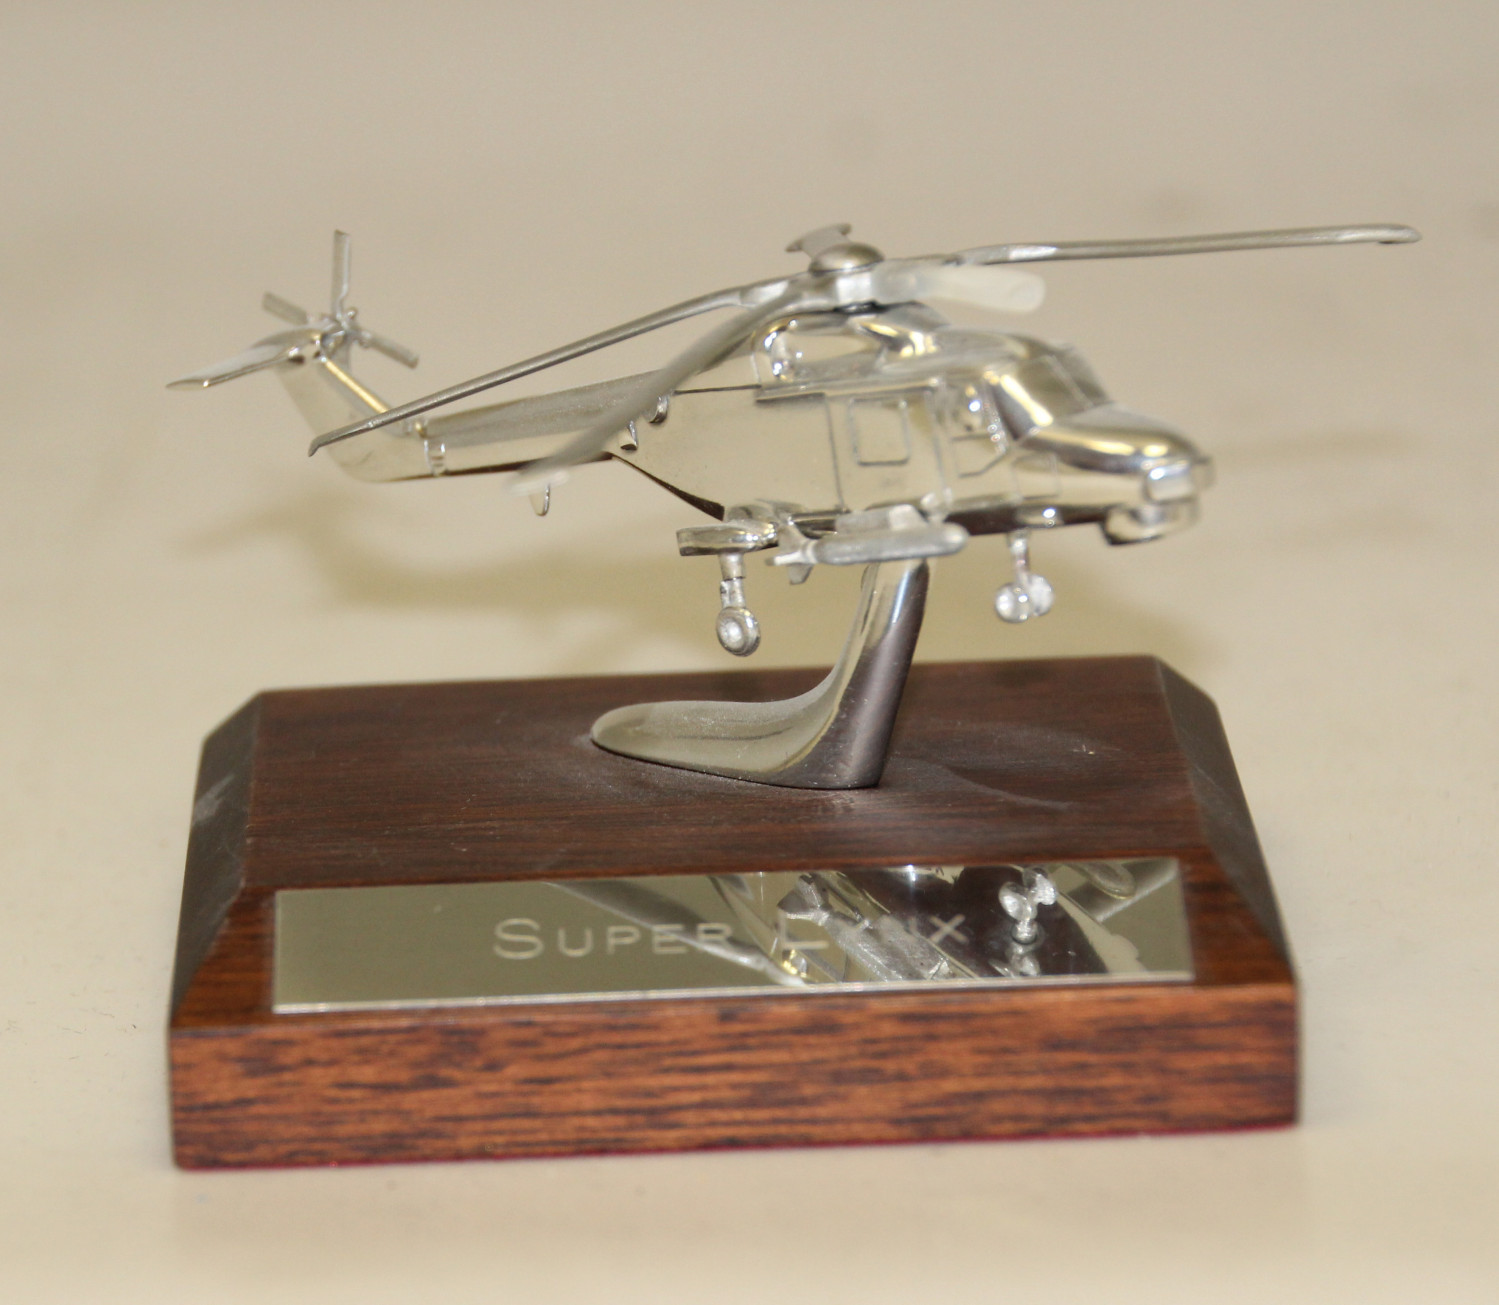 Model of Super Lynx